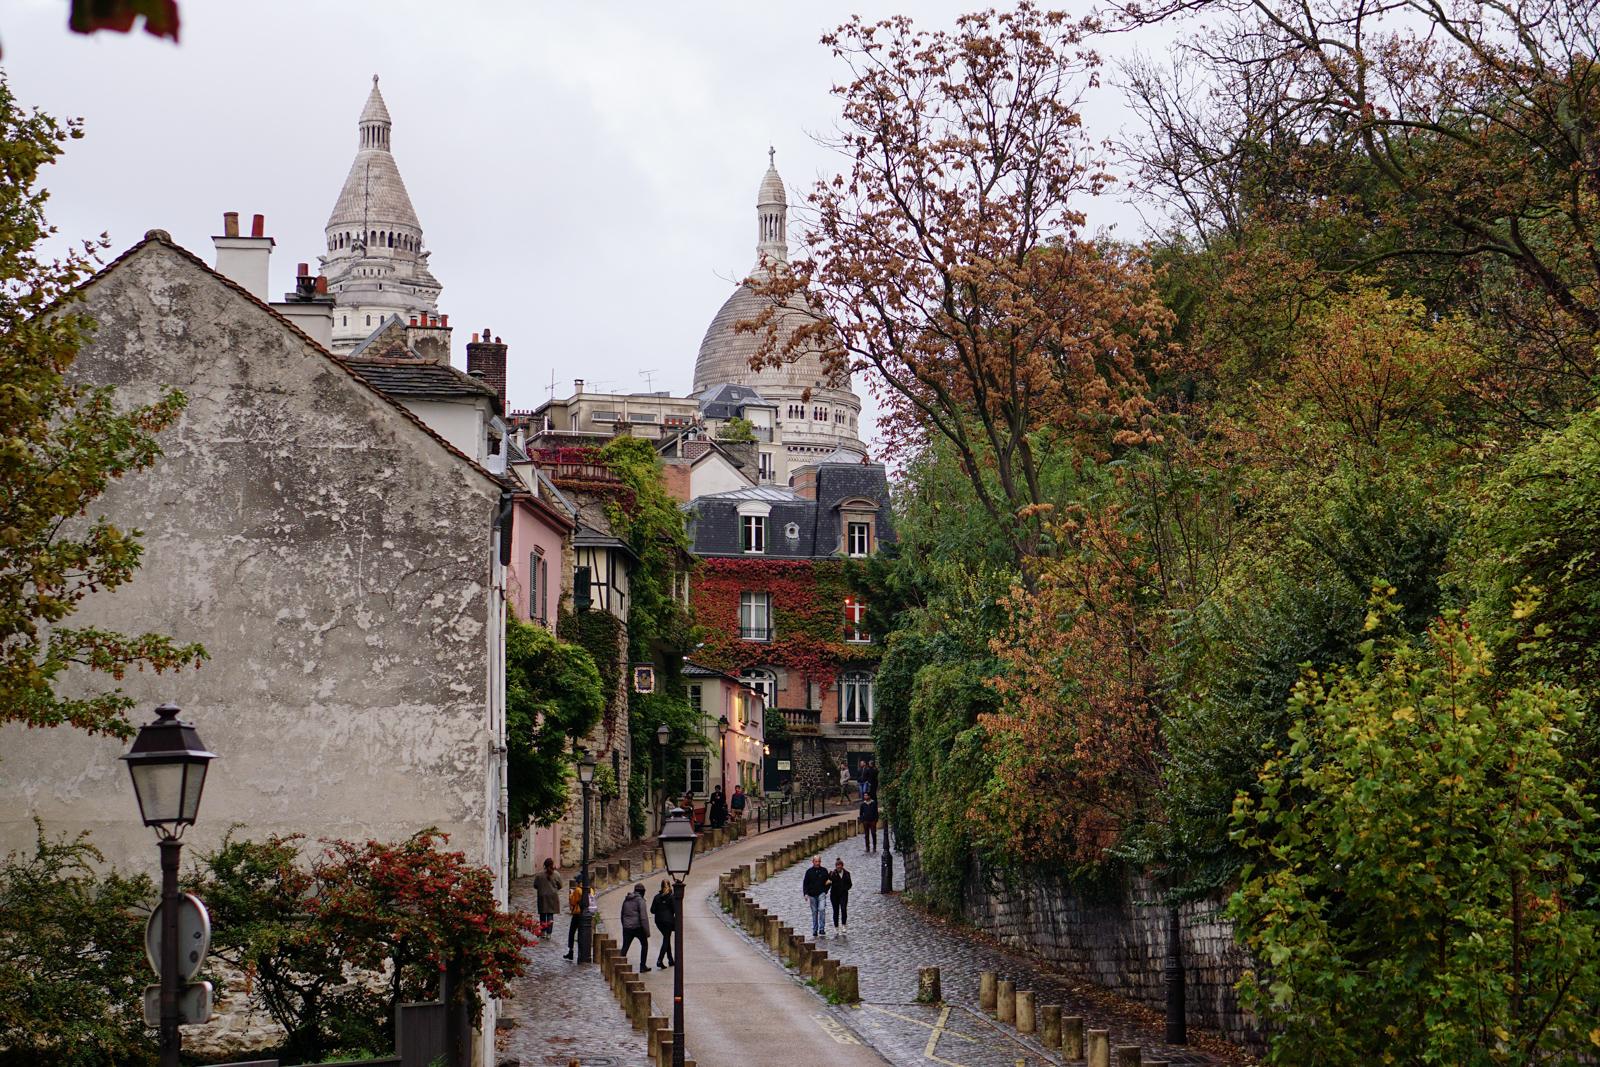 montmartre, montmartre pluie, montmartre automne, balade automne paris, balade paris 18, itinéraire balade paris, paris original, paris authentique